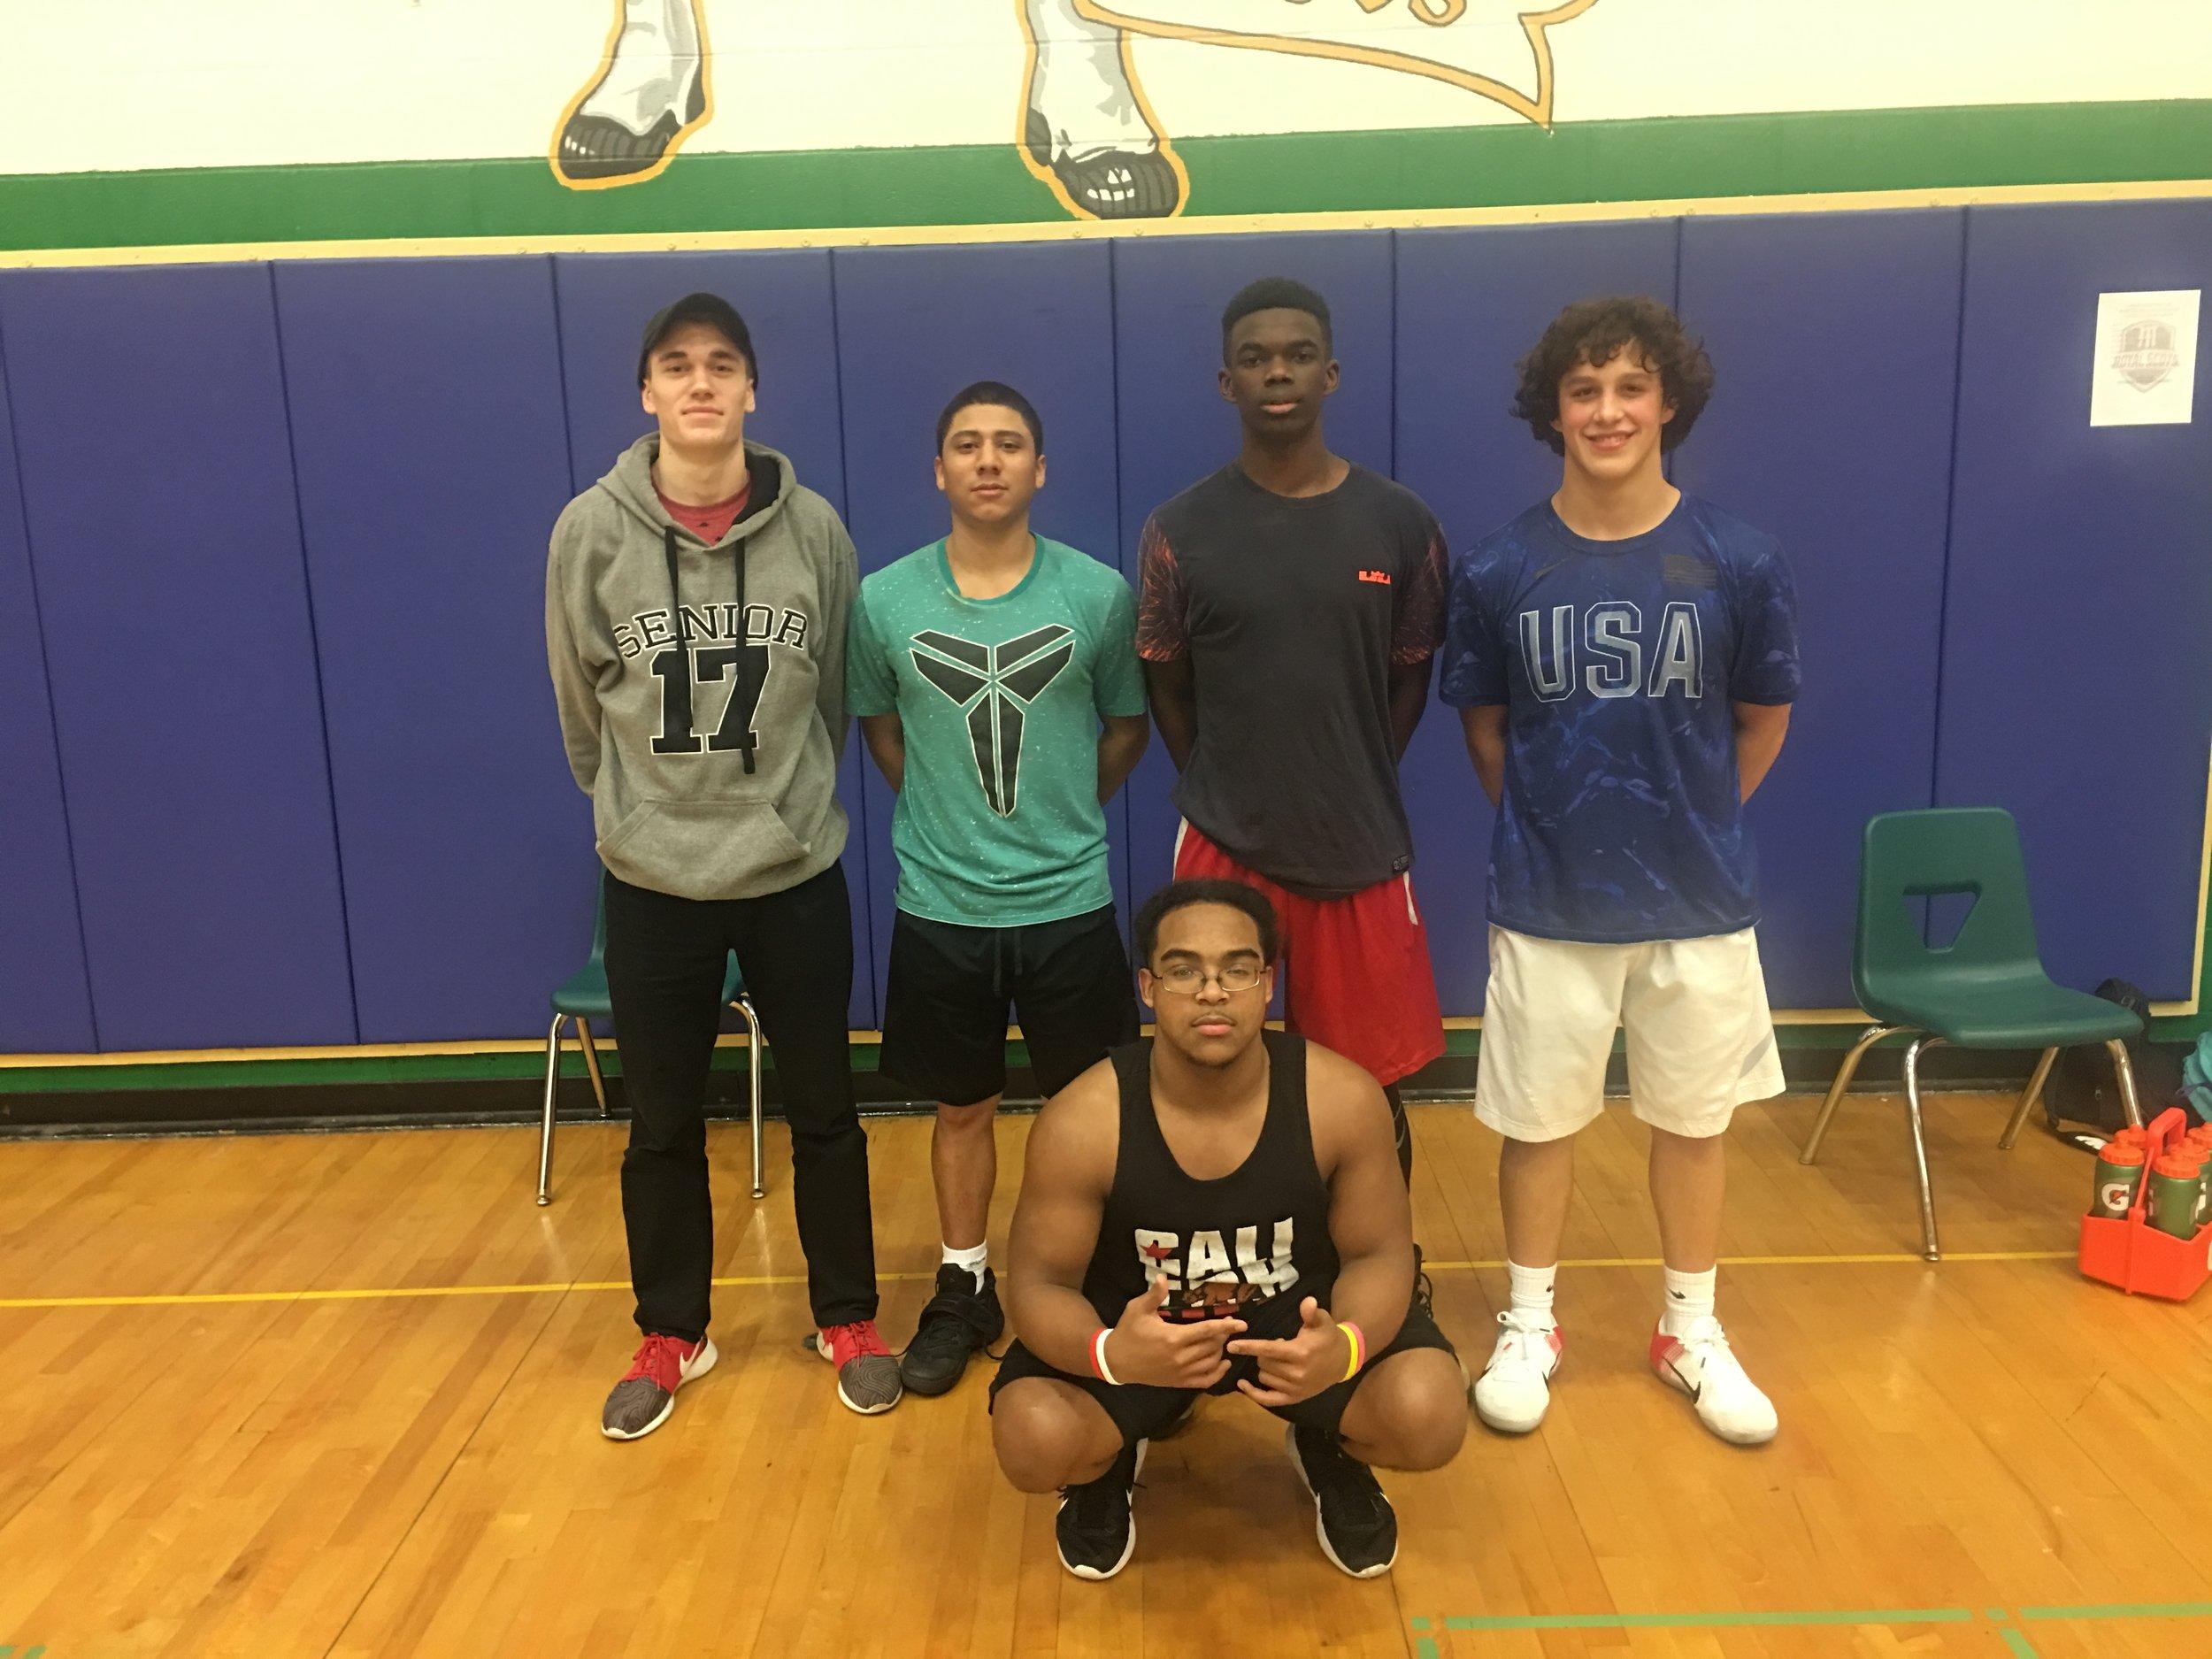 Seniors: Hayden Hull, Josiah Castillo, Shaton Daniels (Bam), Noah Tavera, and manager Bailey.